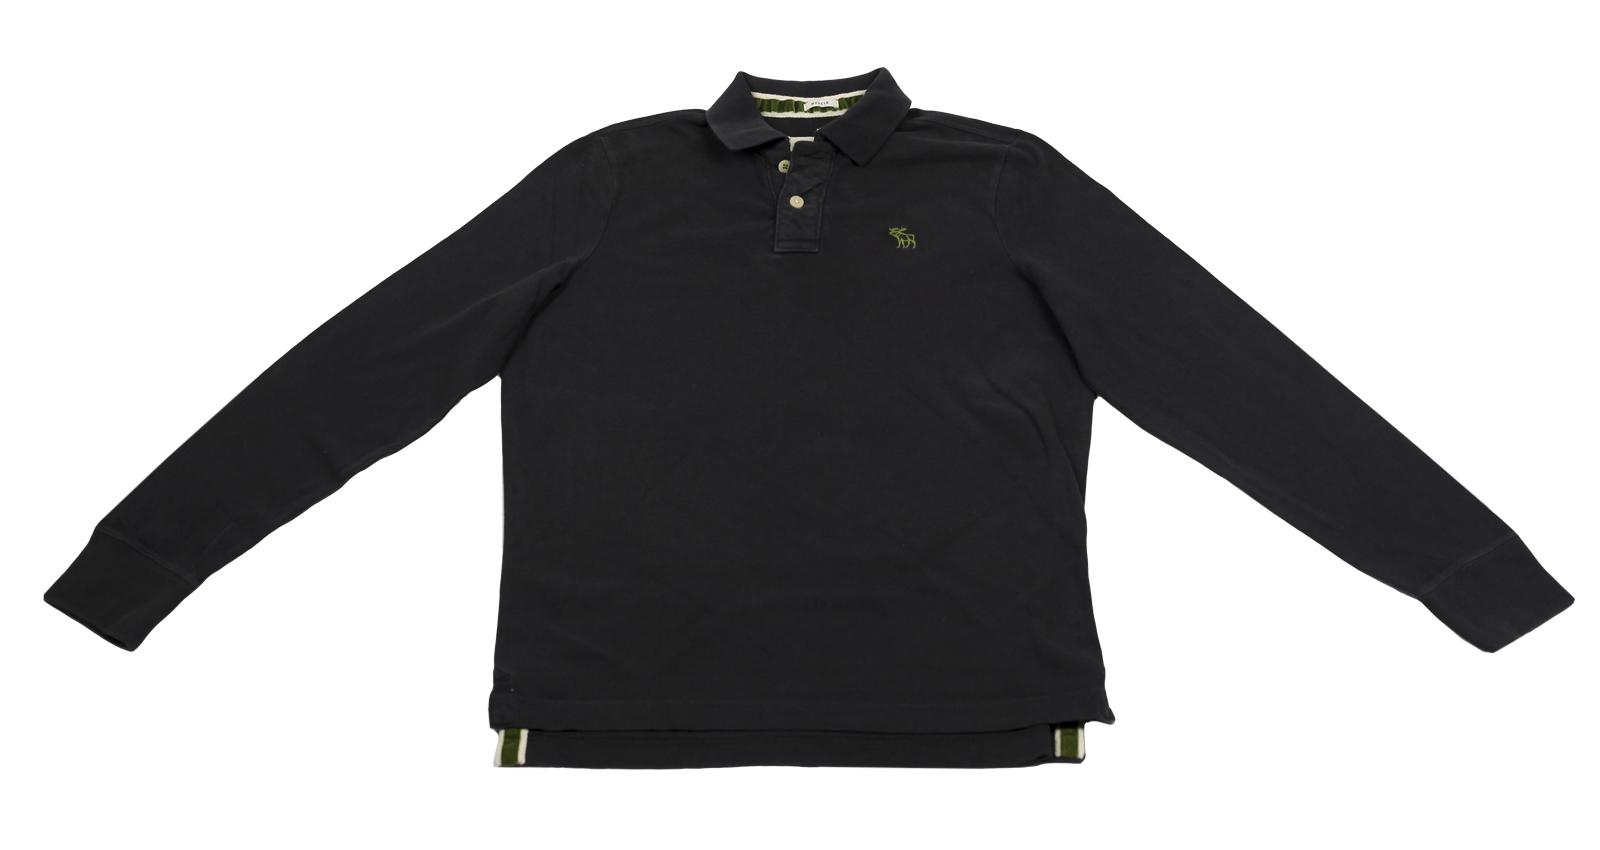 Рубашка-поло с длинным рукавом Abercrombie&Fitch из 100% хлопка